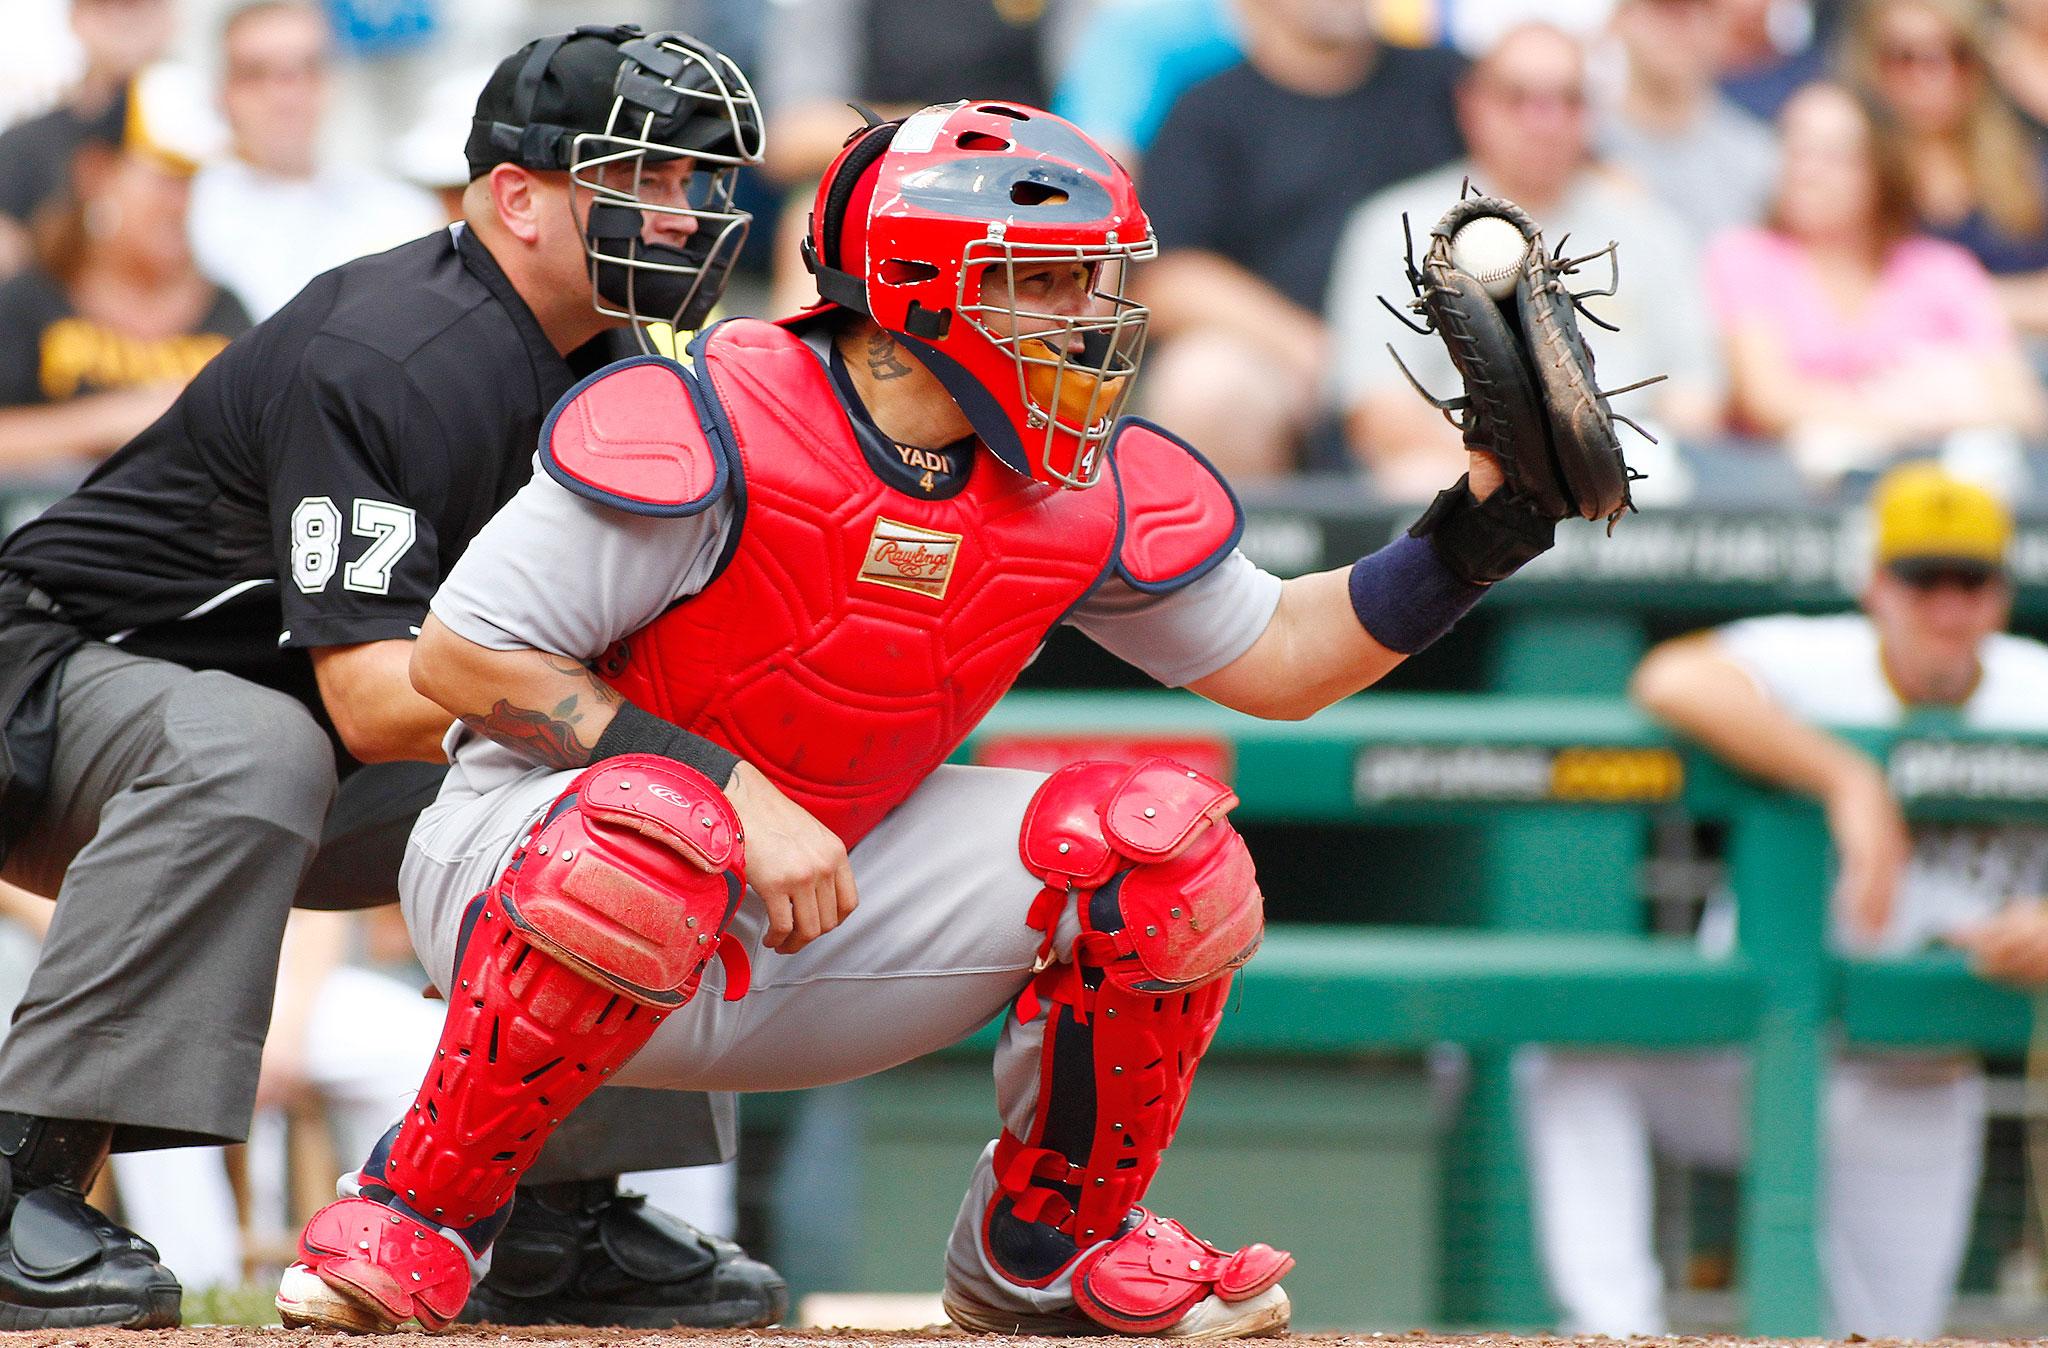 Catcher: Yadier Molina